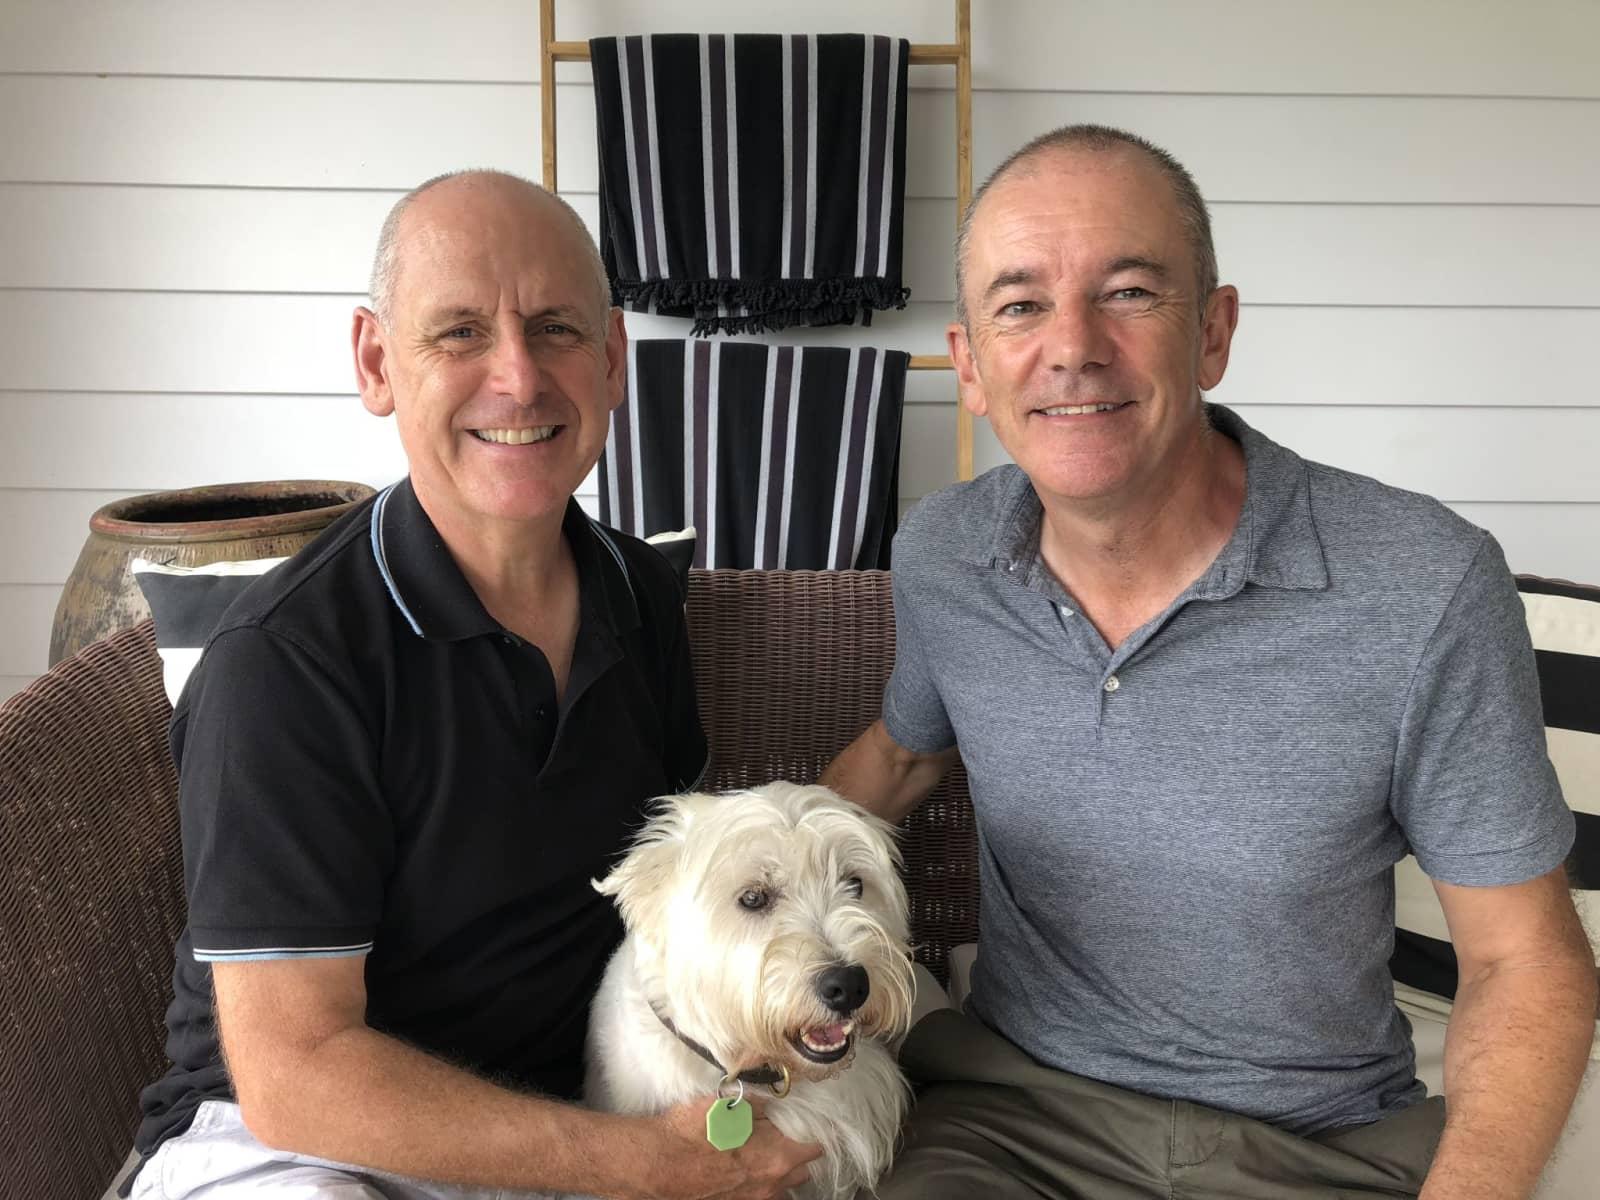 Ian & Lloyd from Sydney, New South Wales, Australia